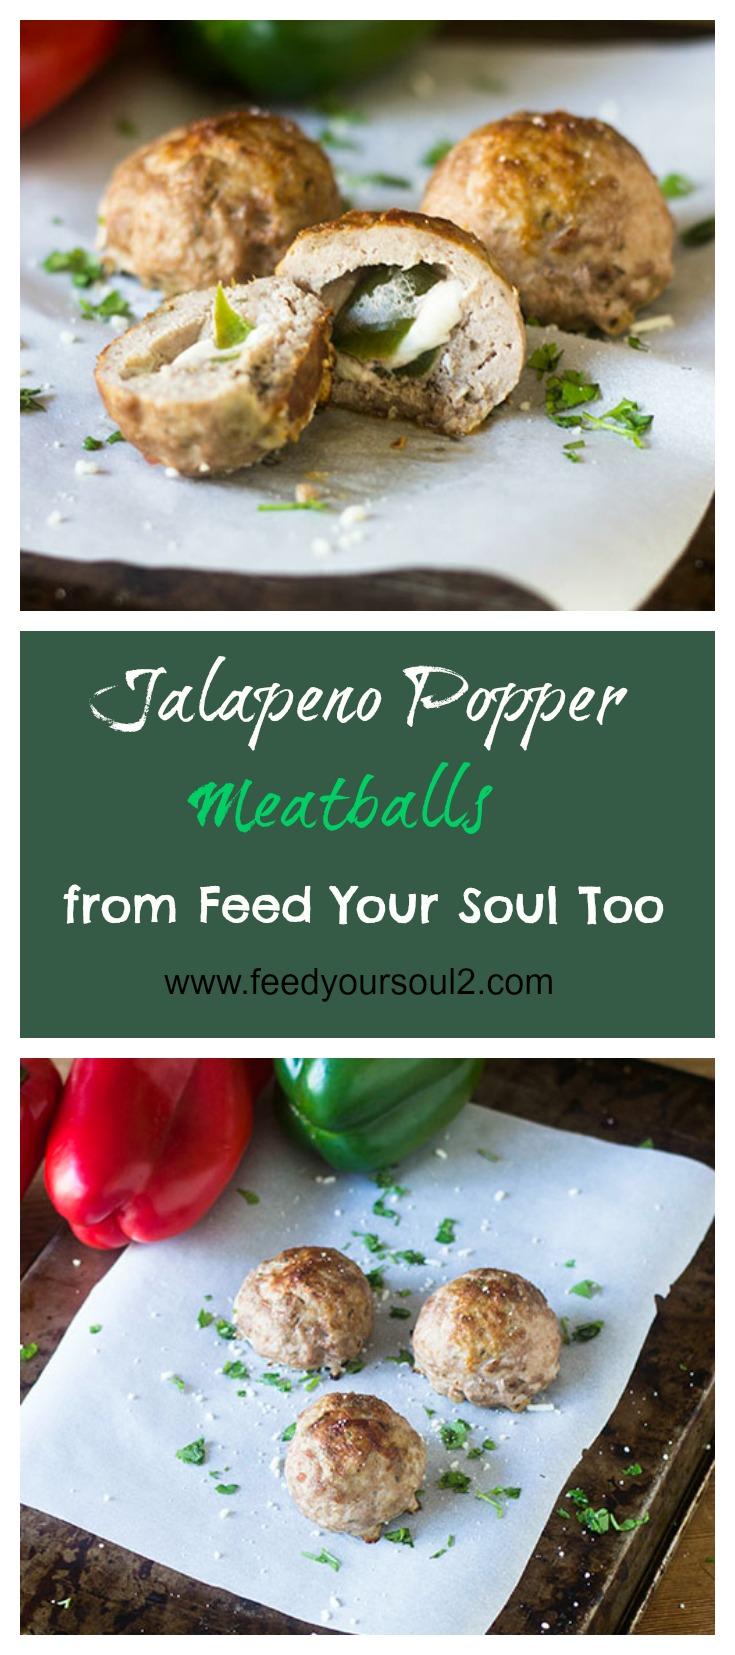 Jalapeno Popper Stuffed Meatballs #meatballs #Mexicanfood #jalapenos #appetizer | feedyoursoul2.com